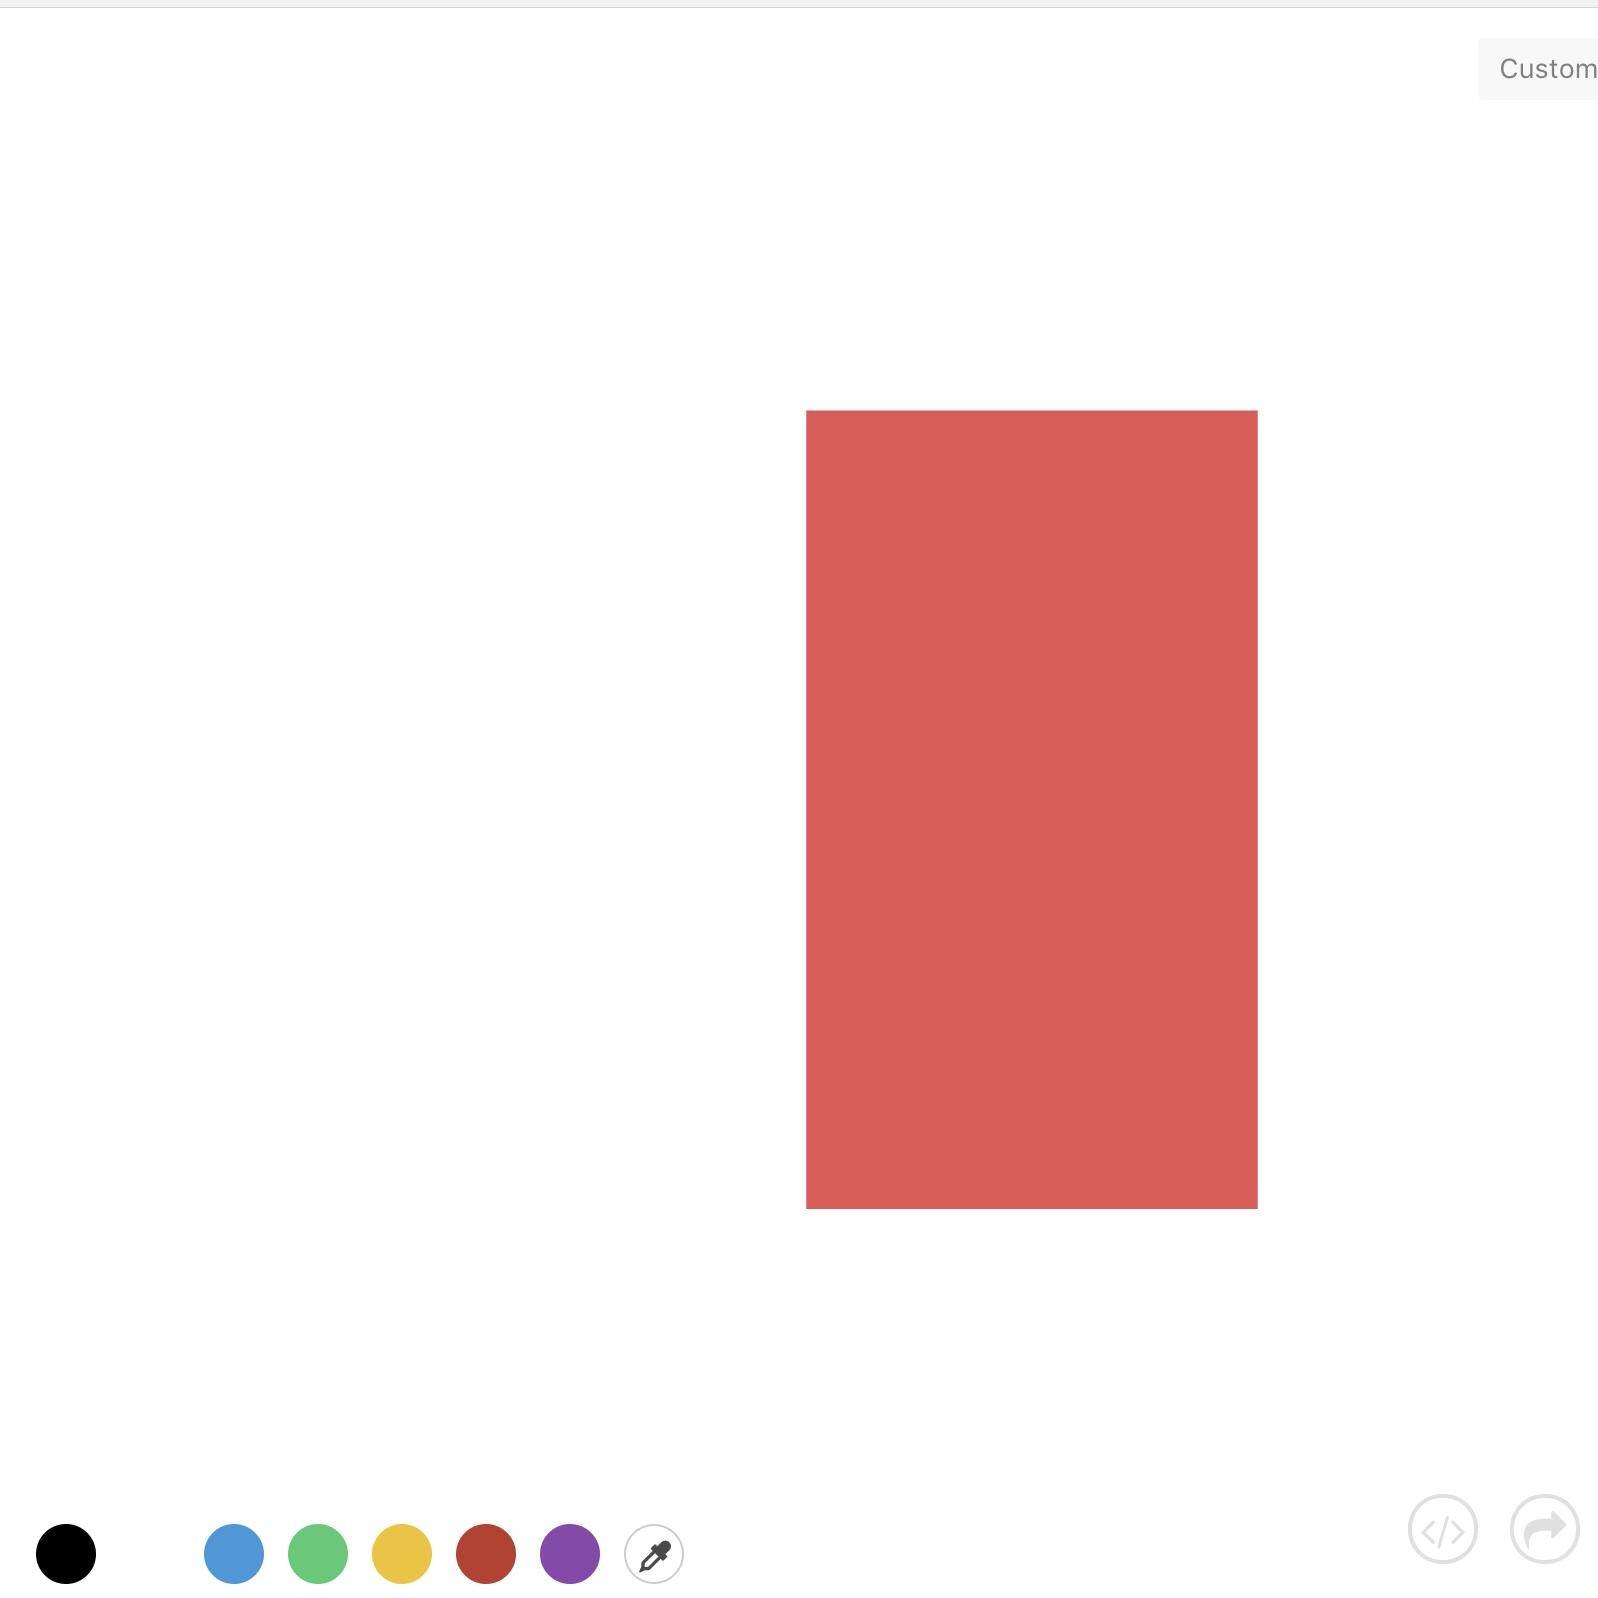 Gradient Effect isn't working! · Issue #823 · airbnb/lottie